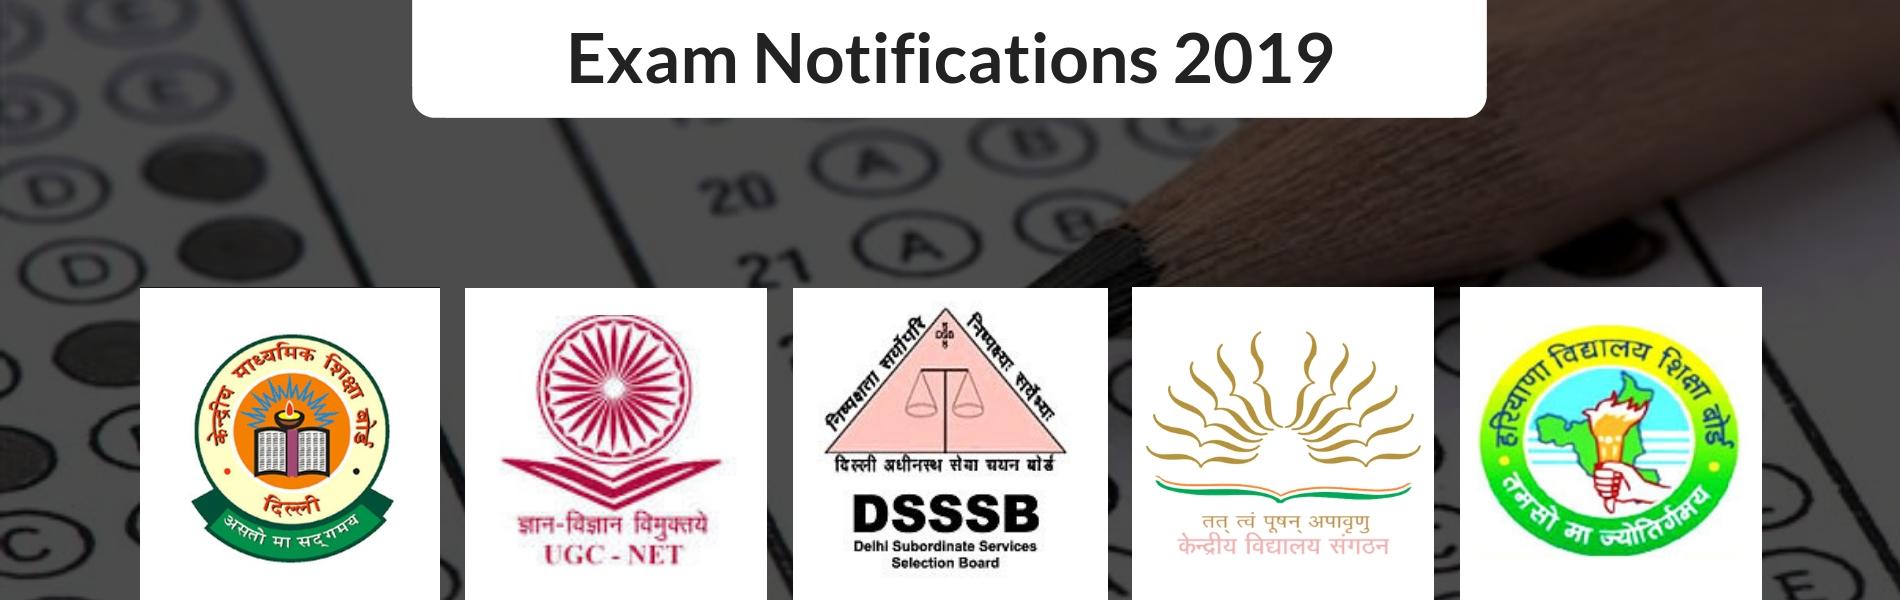 2019 Exam Notification